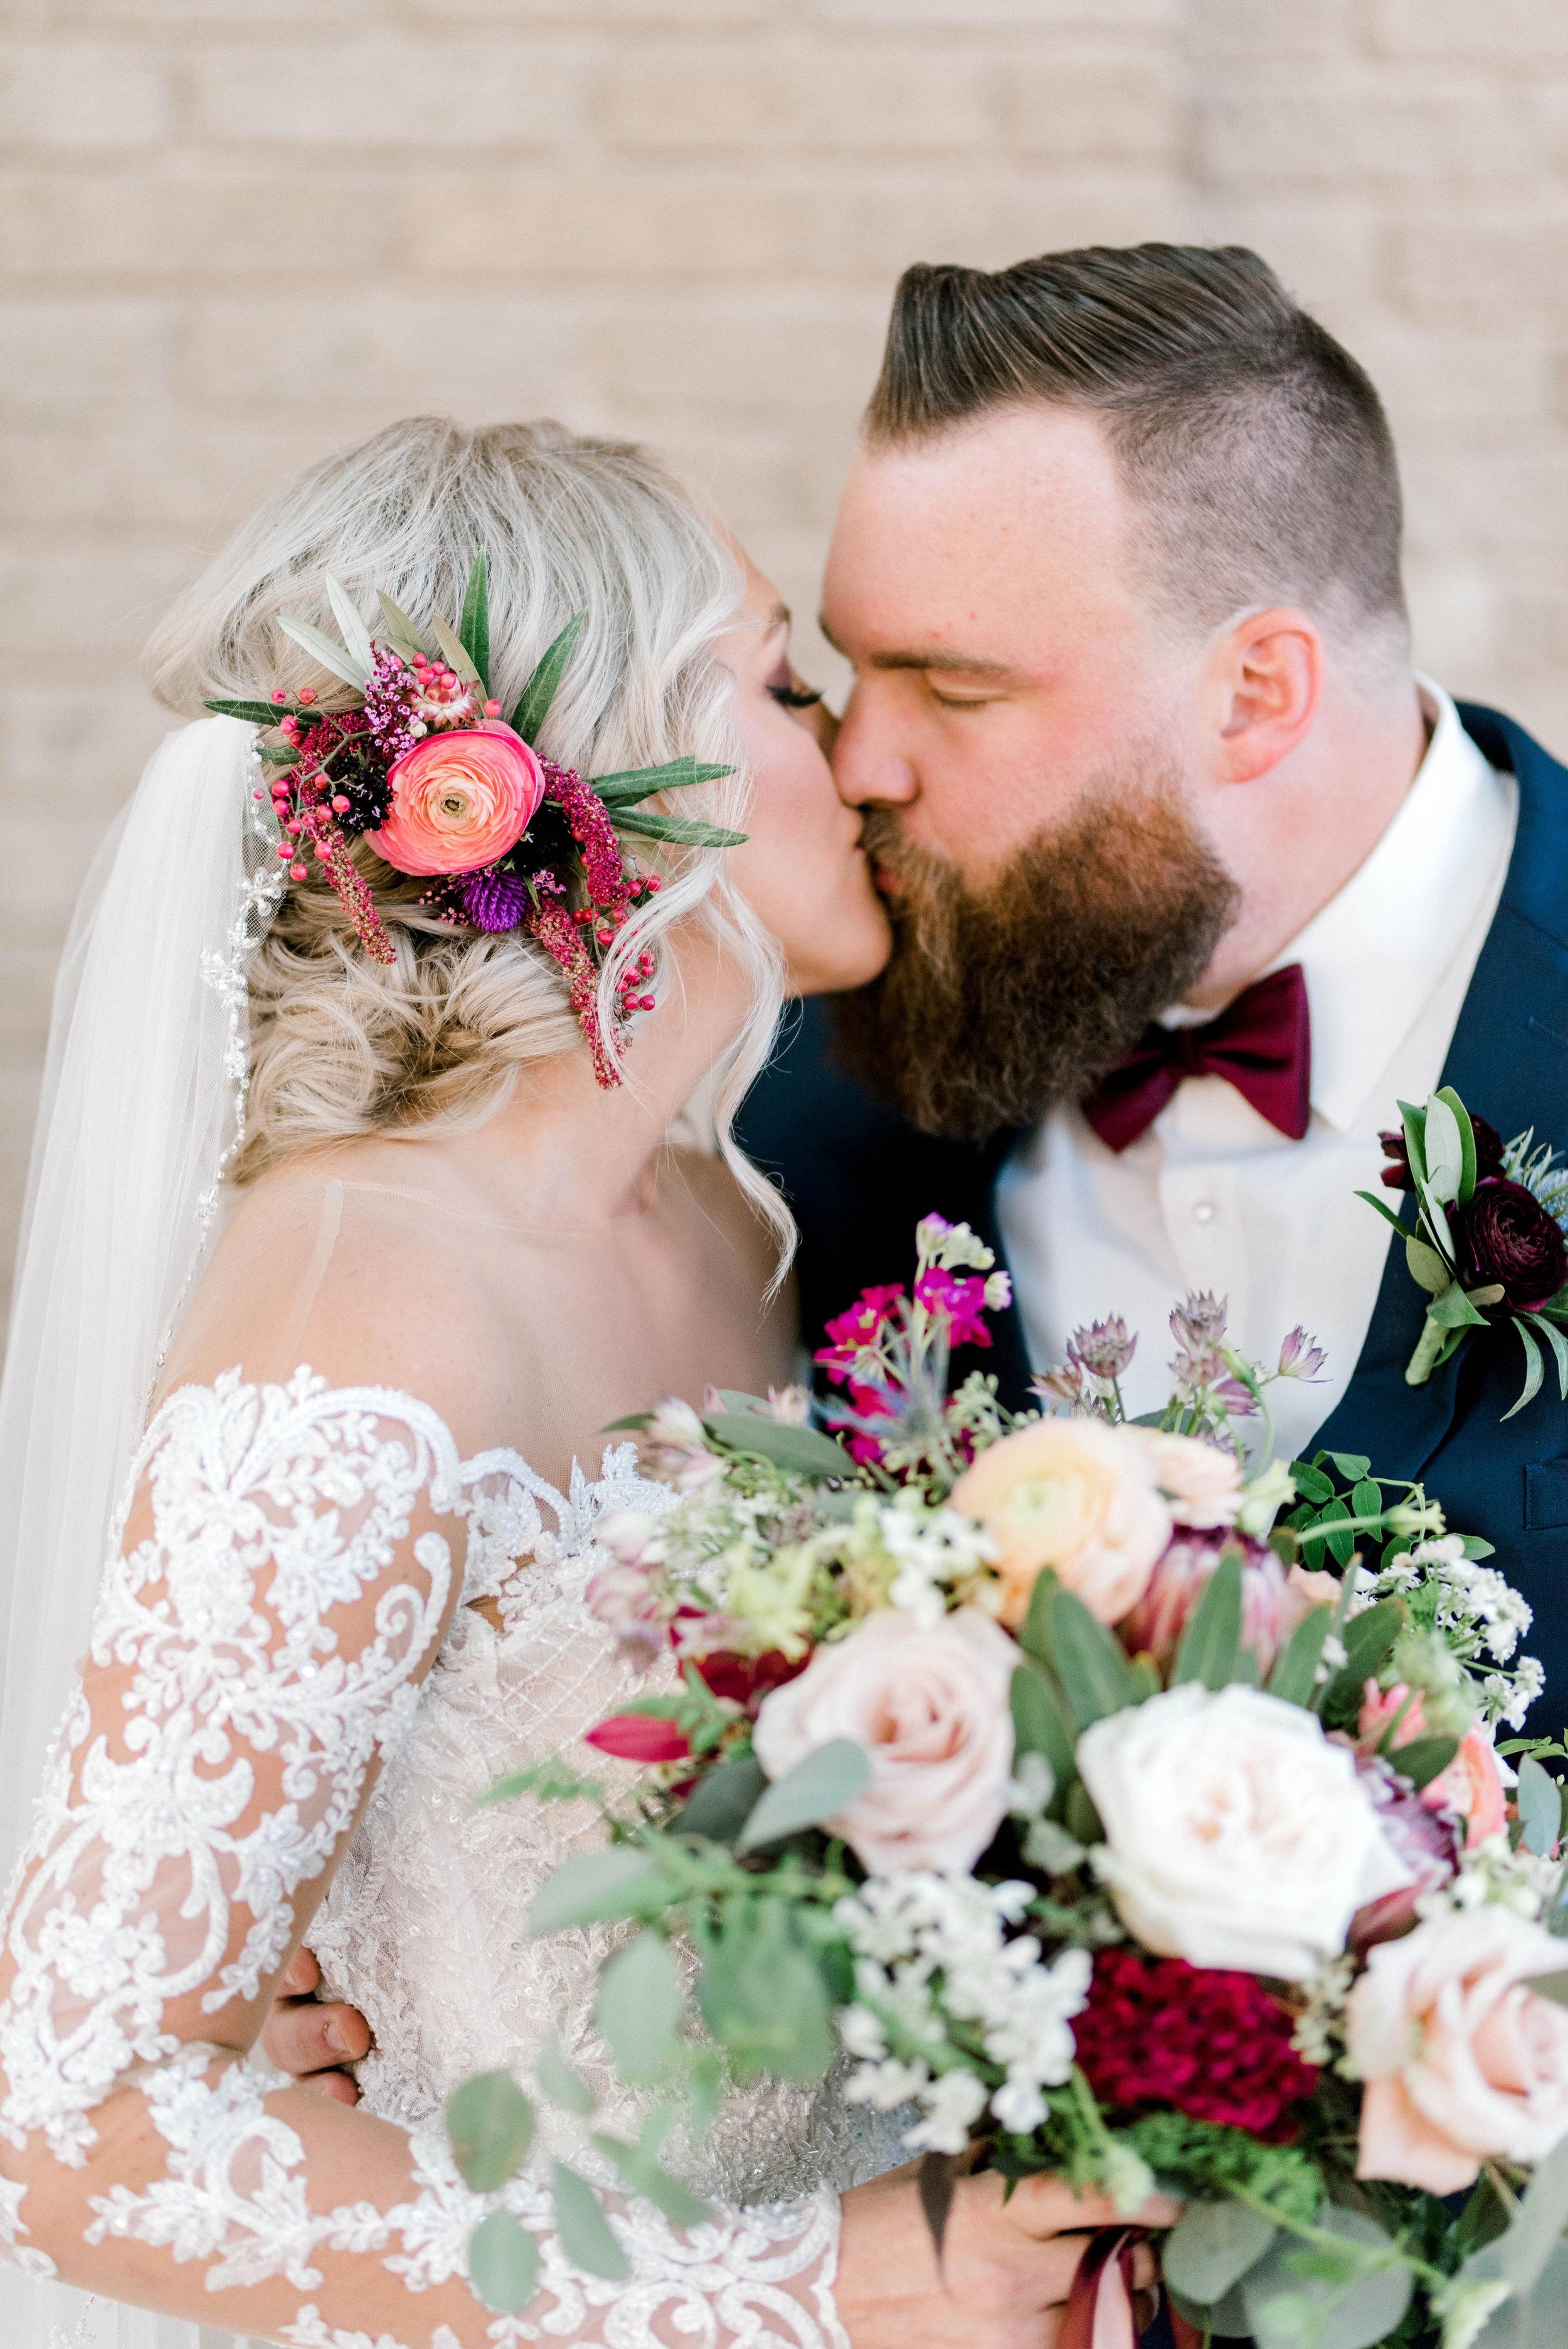 Ryan Alexa Married-Portraits-0024.jpg